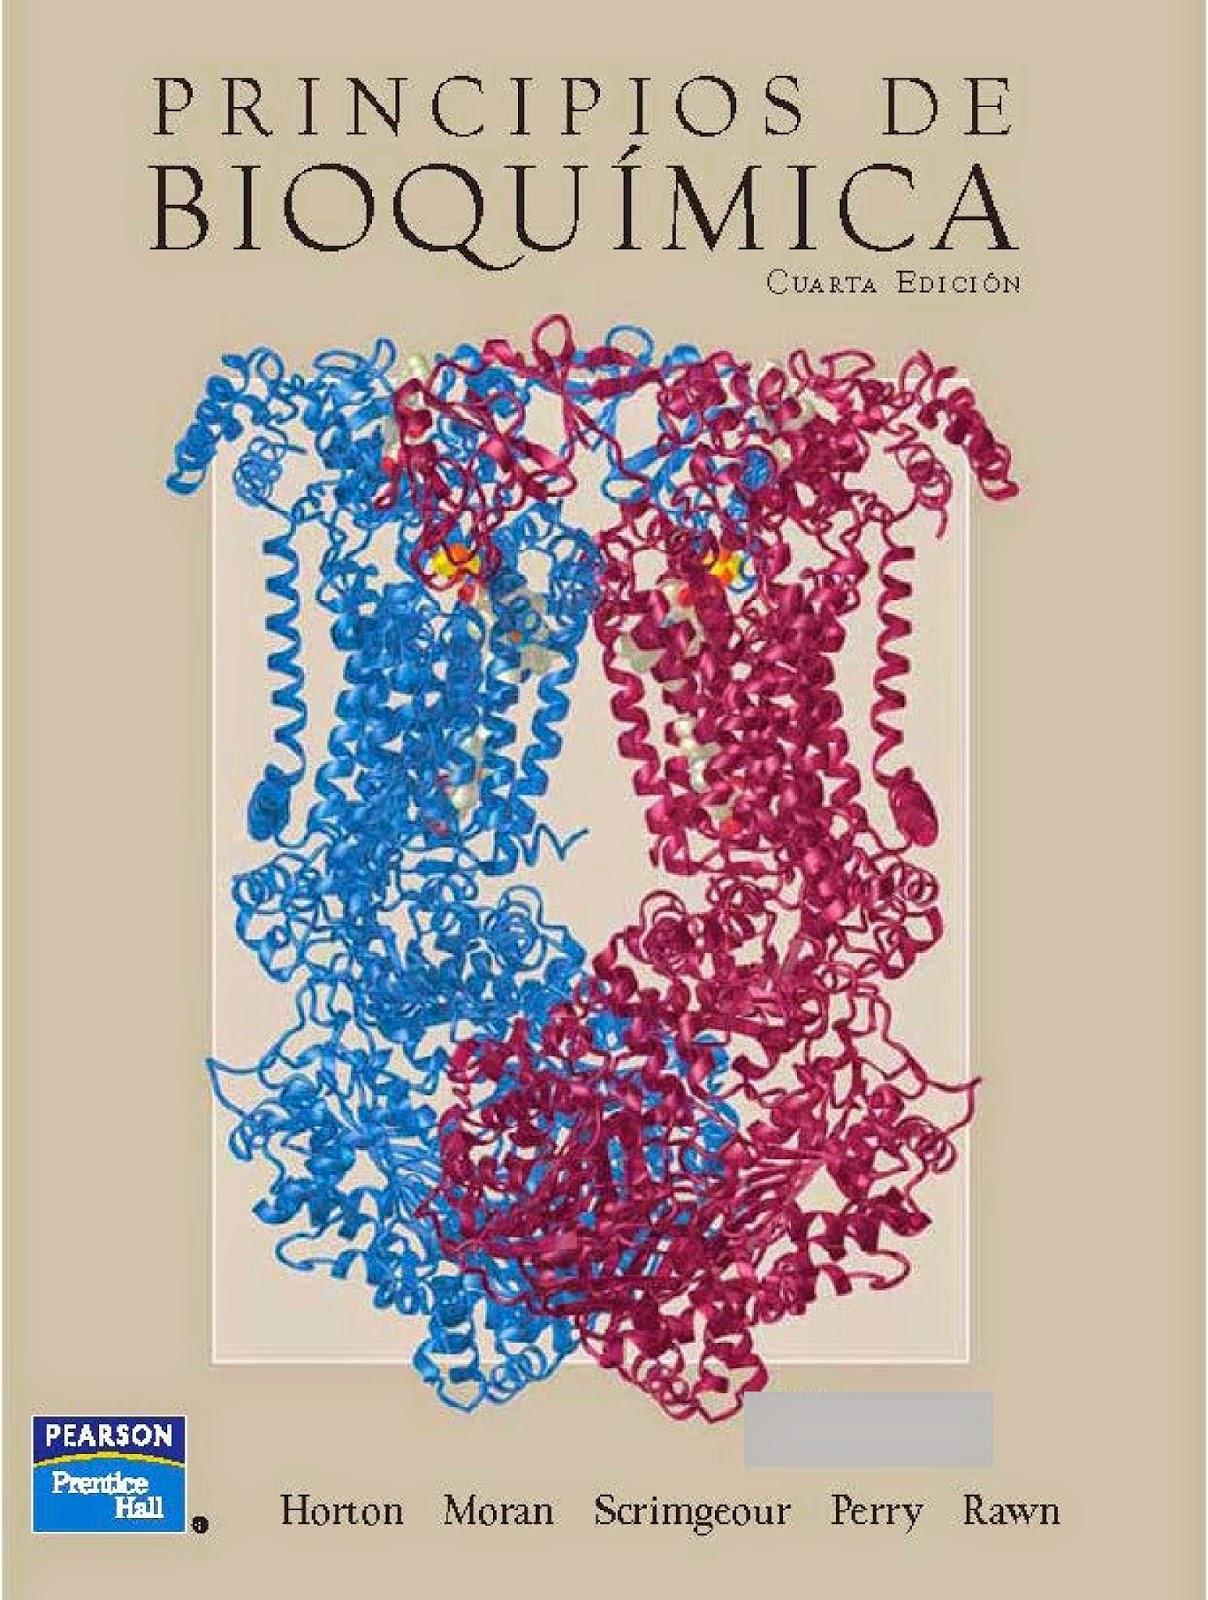 Principios de bioquimica horton